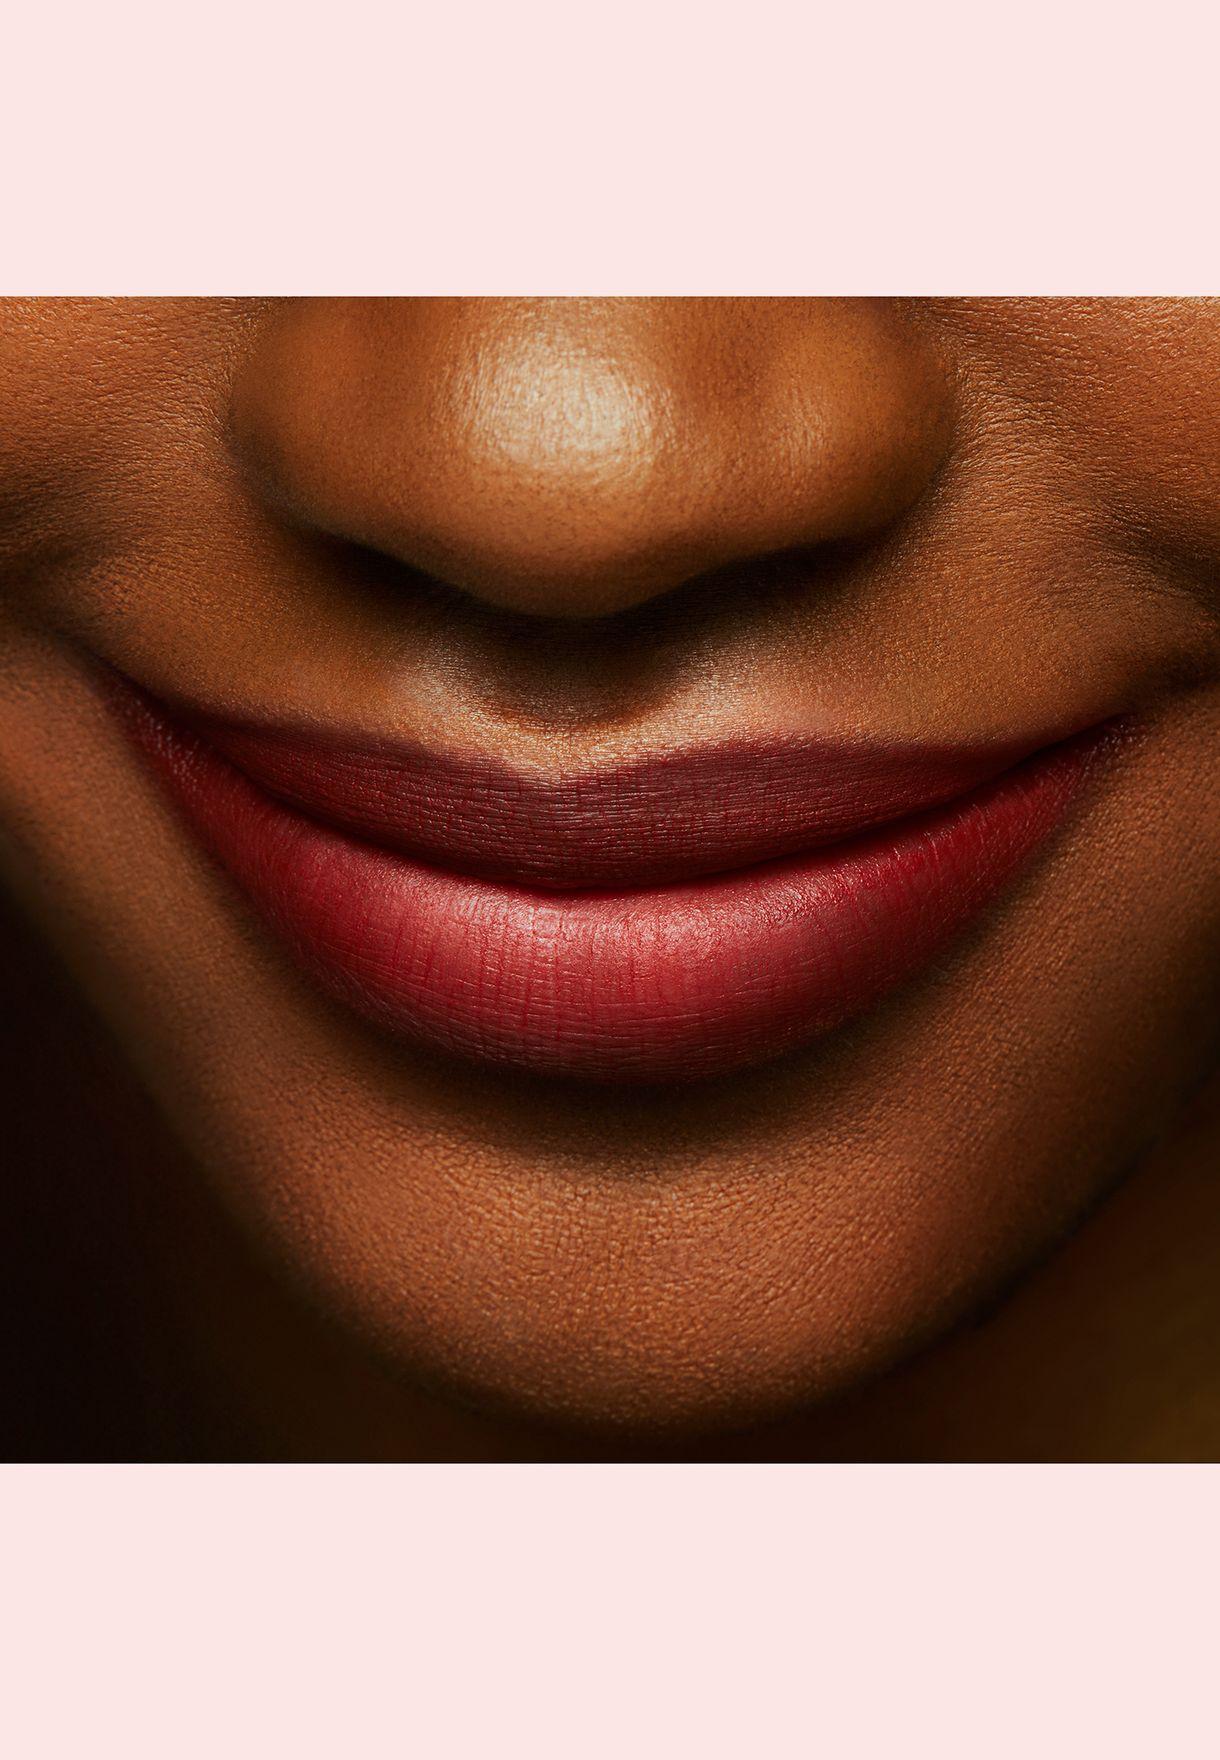 Powder Kiss Lipstick - Dubonnet Buzz